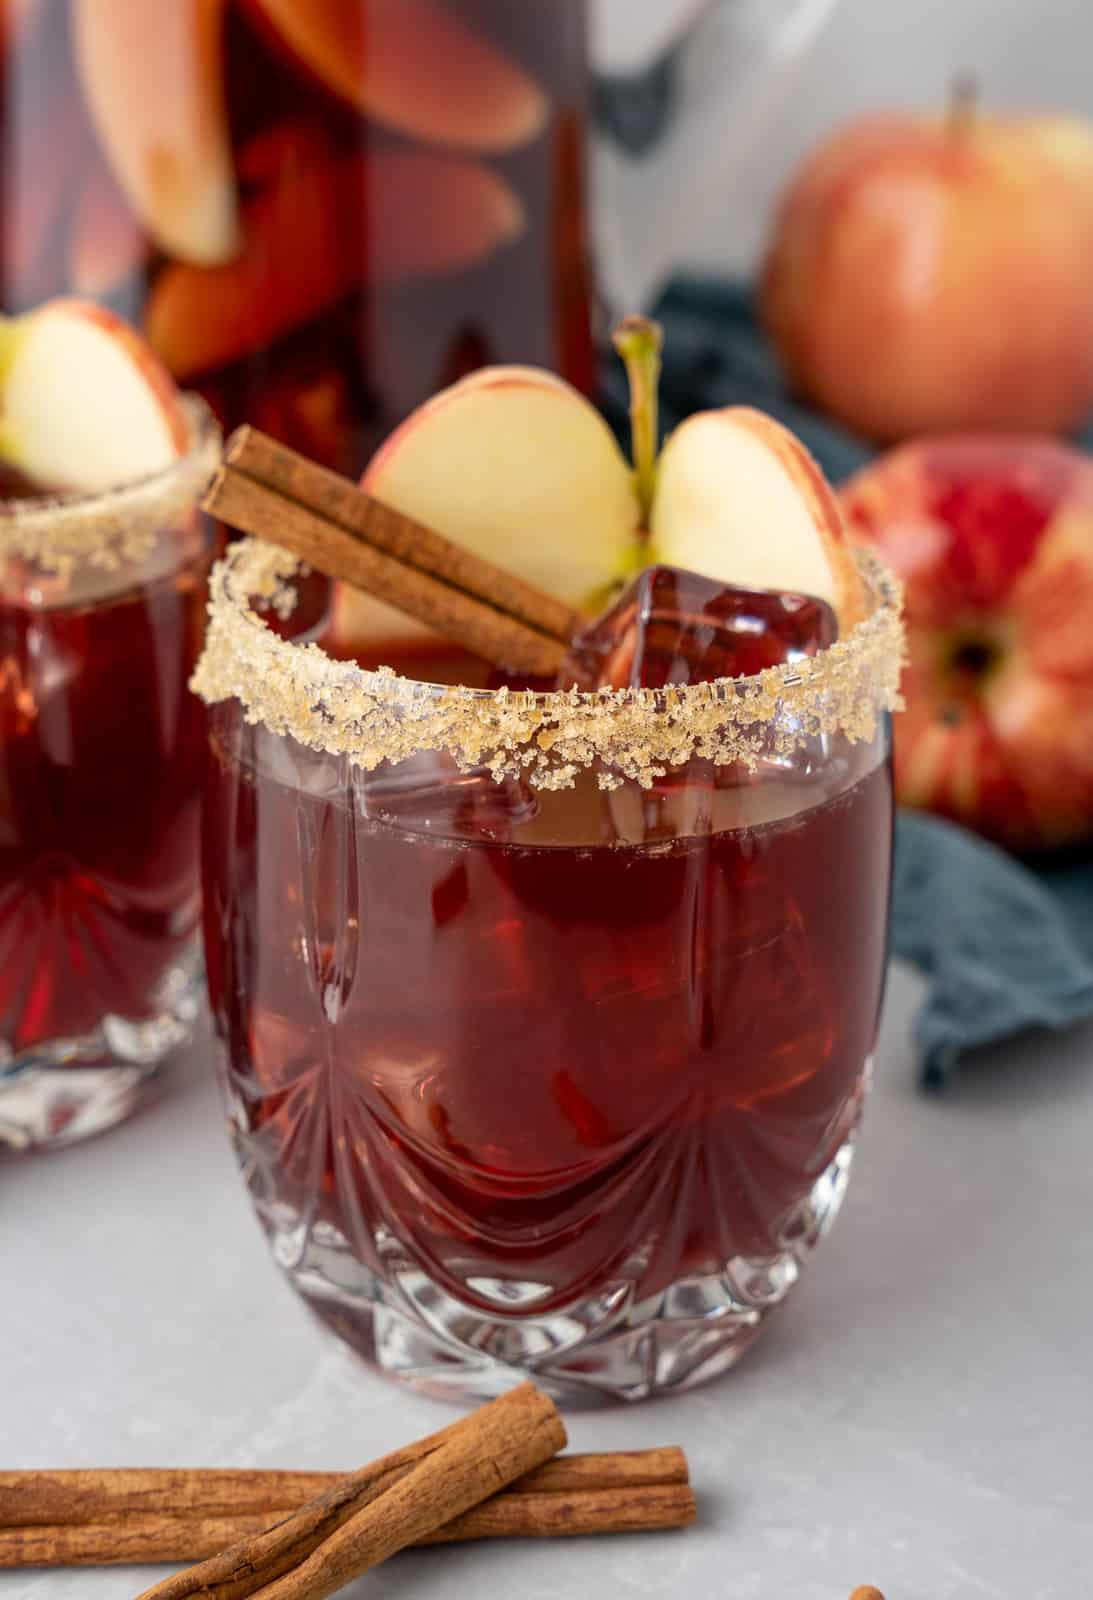 Glass of Apple Cider Sangria with apple slice and cinnamon stick.